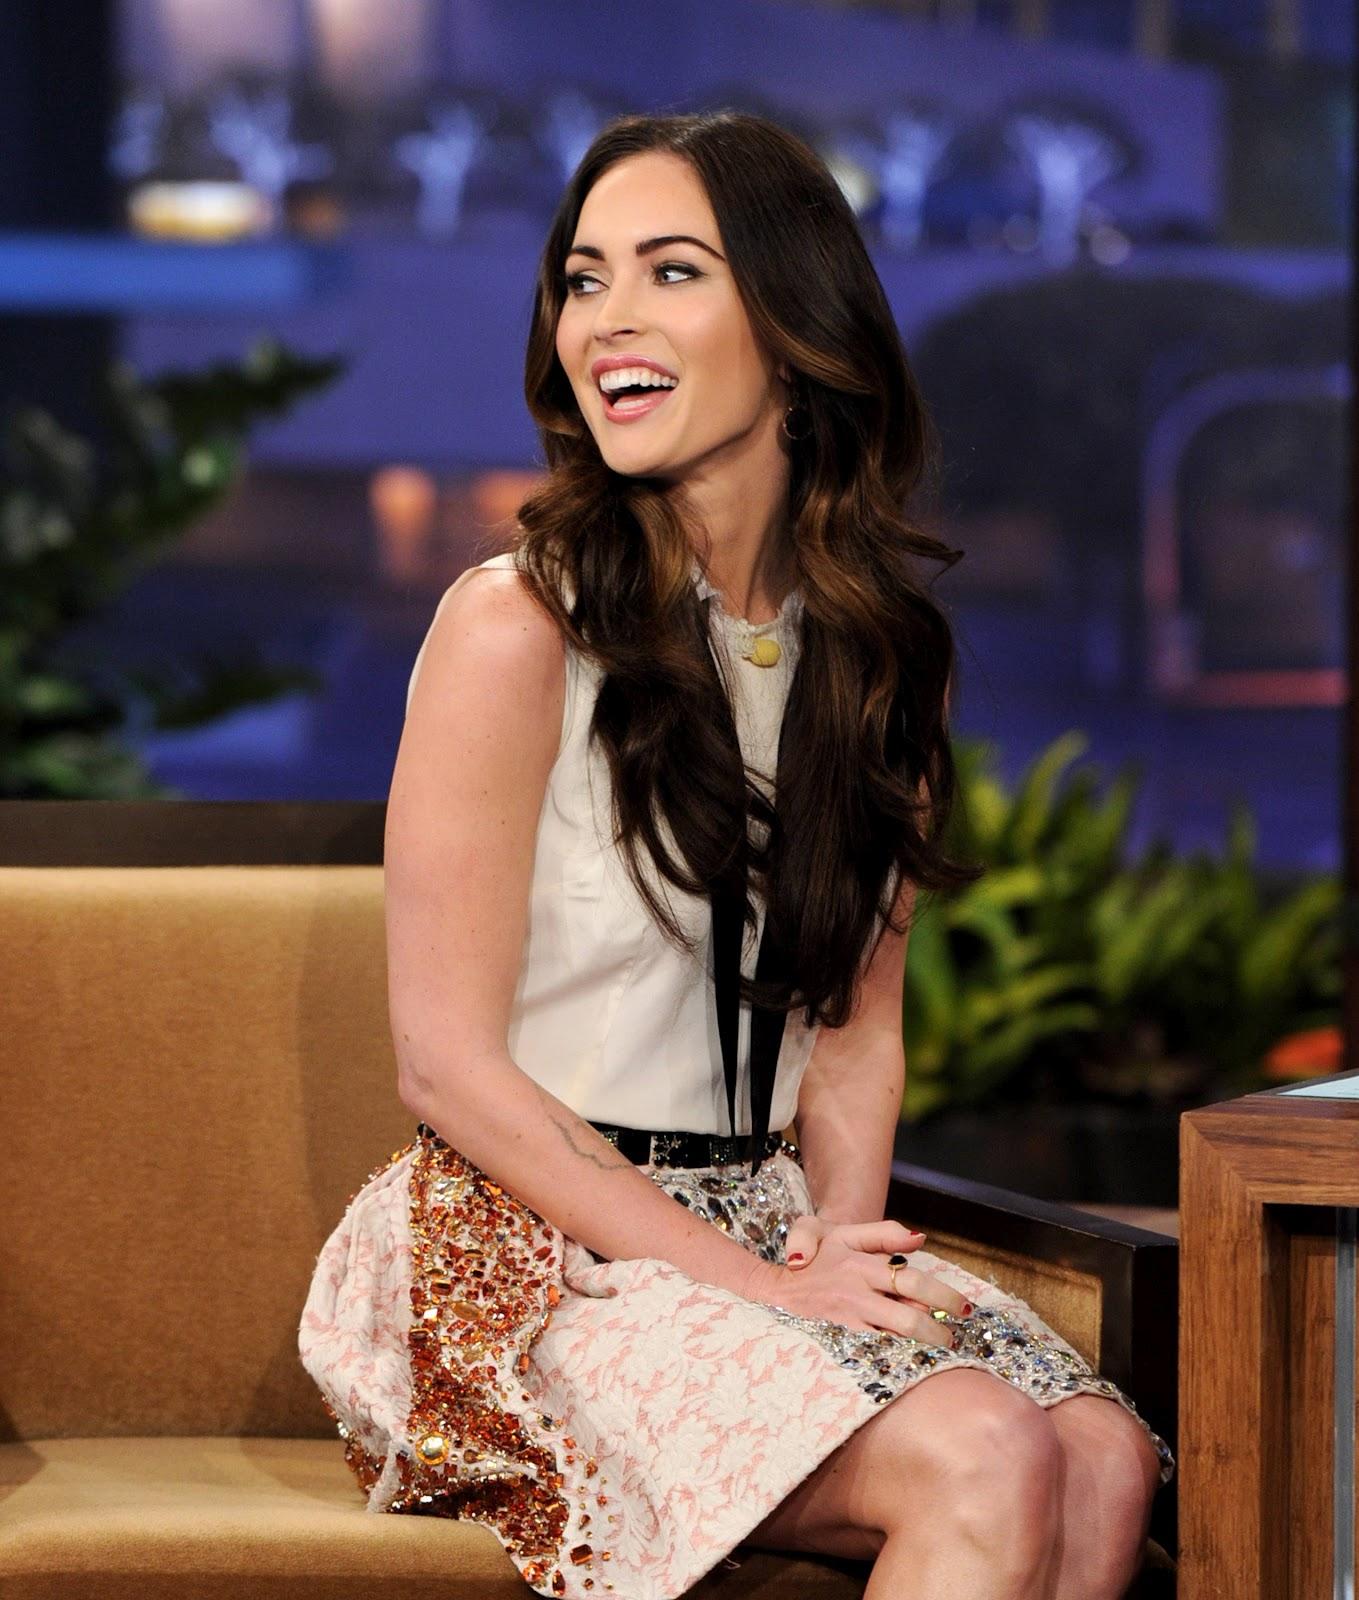 Megan Fox: Megan Fox Leggy In A Television Show